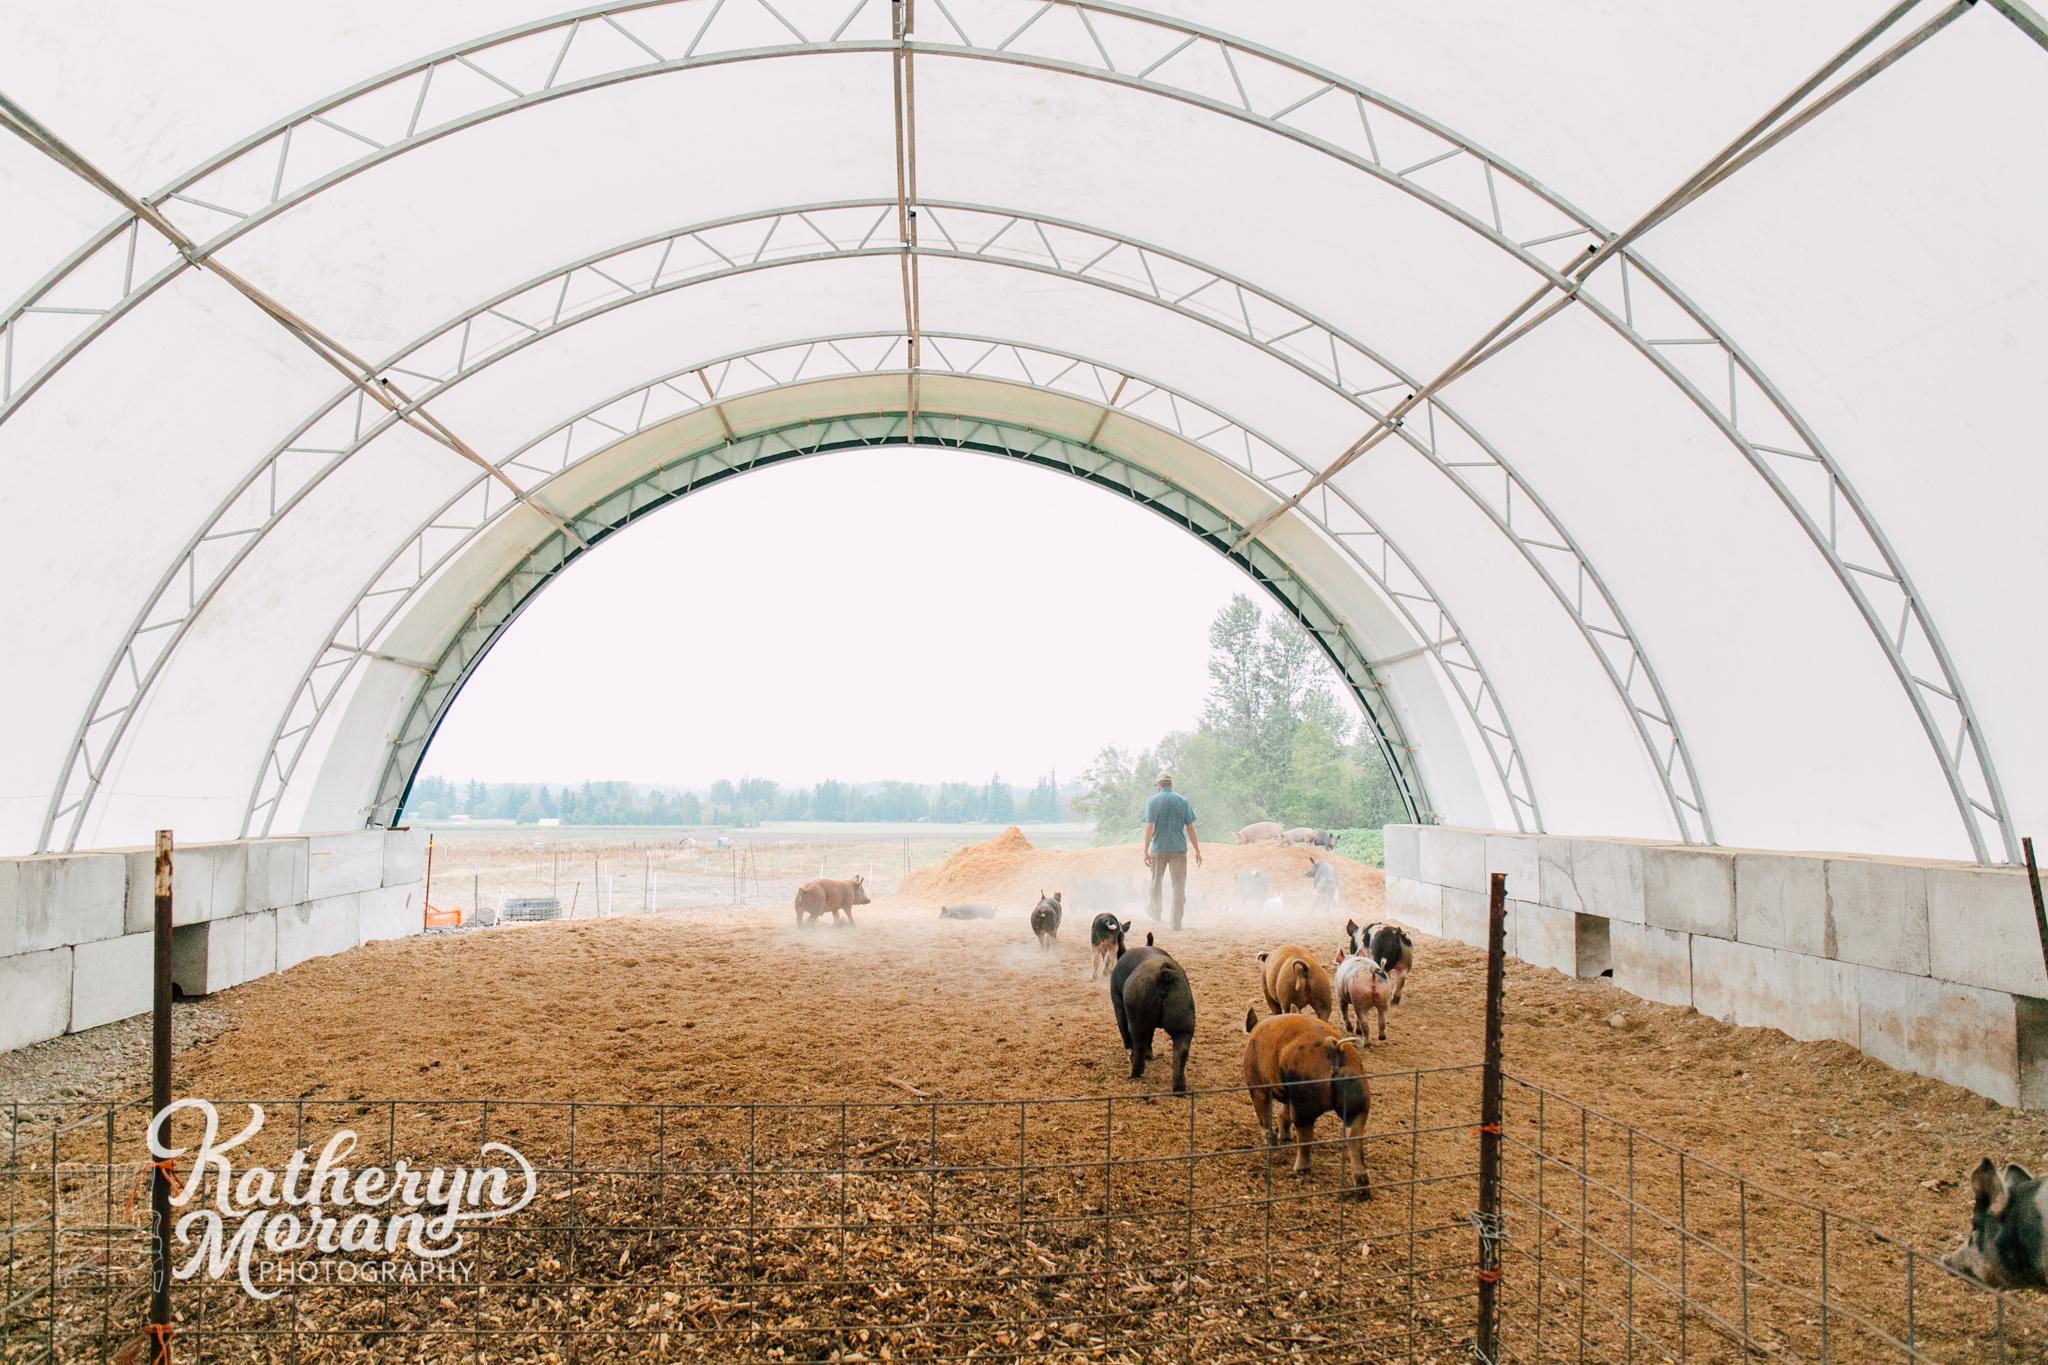 alluvial-farms-katheryn-moran-photography-september-2018-3.jpg